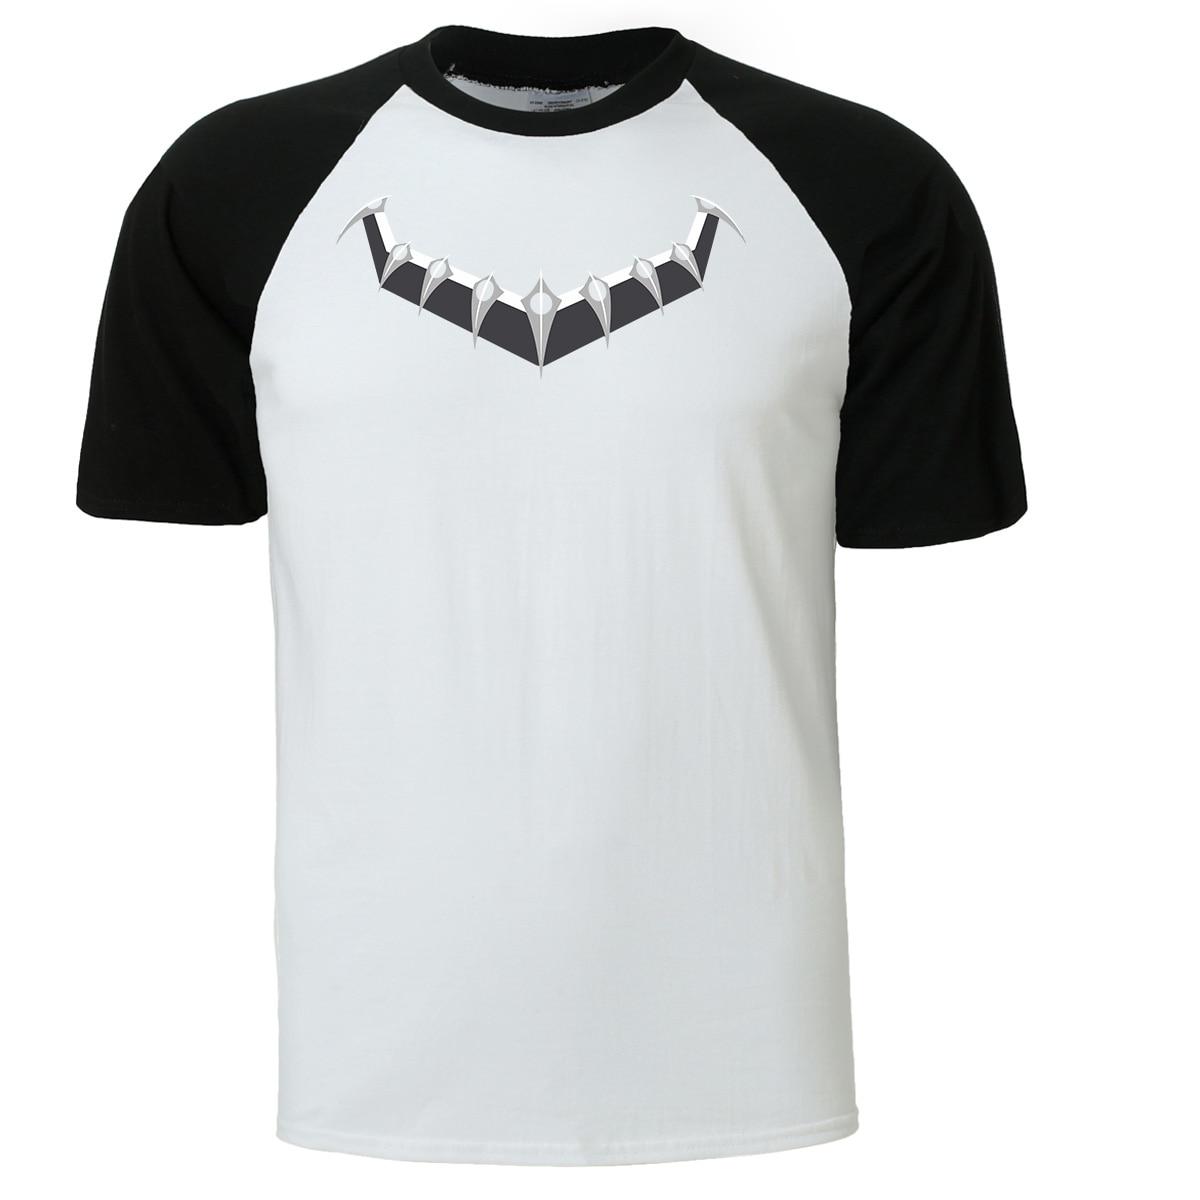 Superhero BLACK PANTHER T Shirt Men 2019 Fashion Summer Spring Cotton Man's T-shirt Hip Hop Top Tee Shirts Streetwear T-shirts